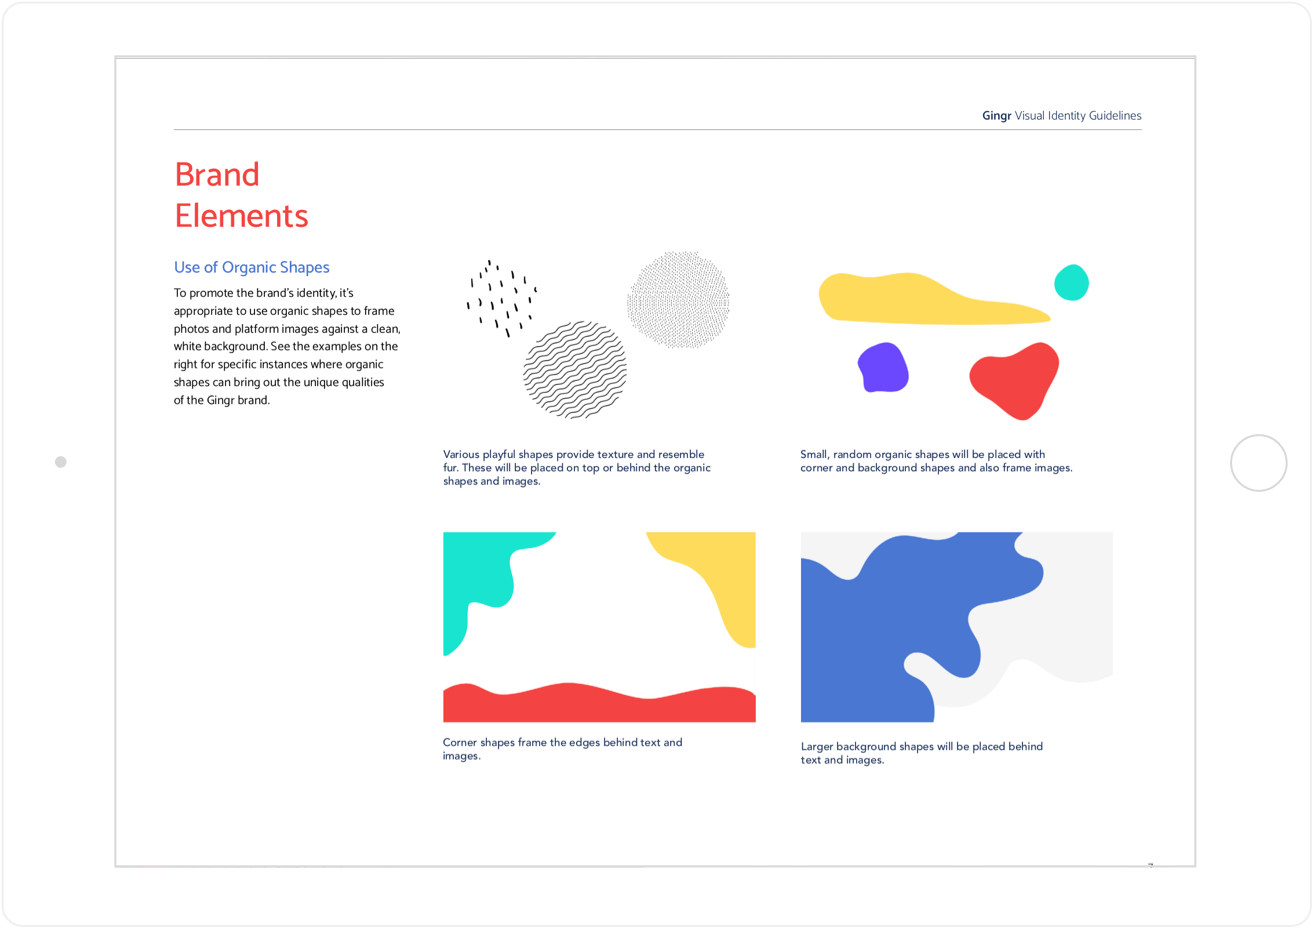 Gingr Brand Elements